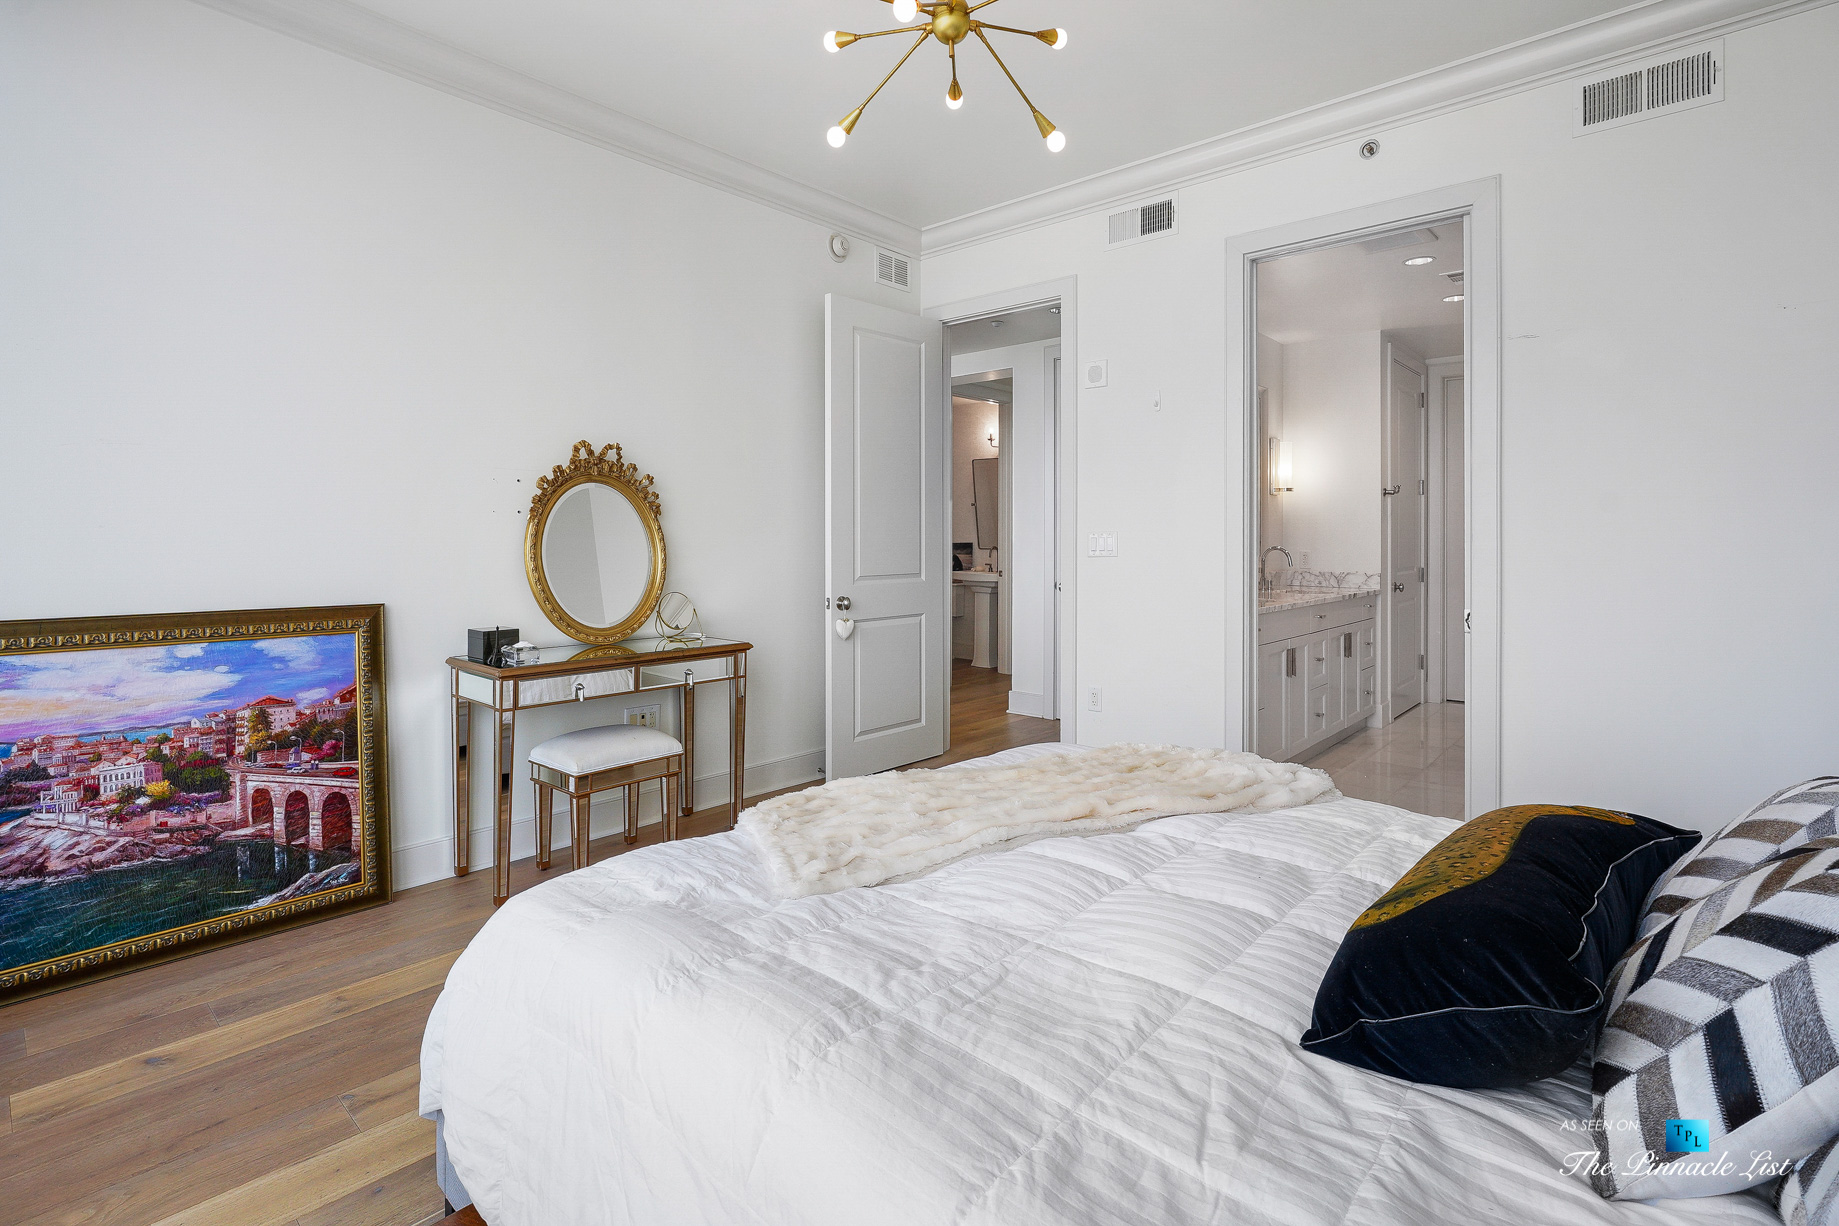 3630 Peachtree Rd NE, Unit 2307, Atlanta, GA, USA - Apartment Master Bedroom - Luxury Real Estate - Ritz-Carlton Residences Buckhead